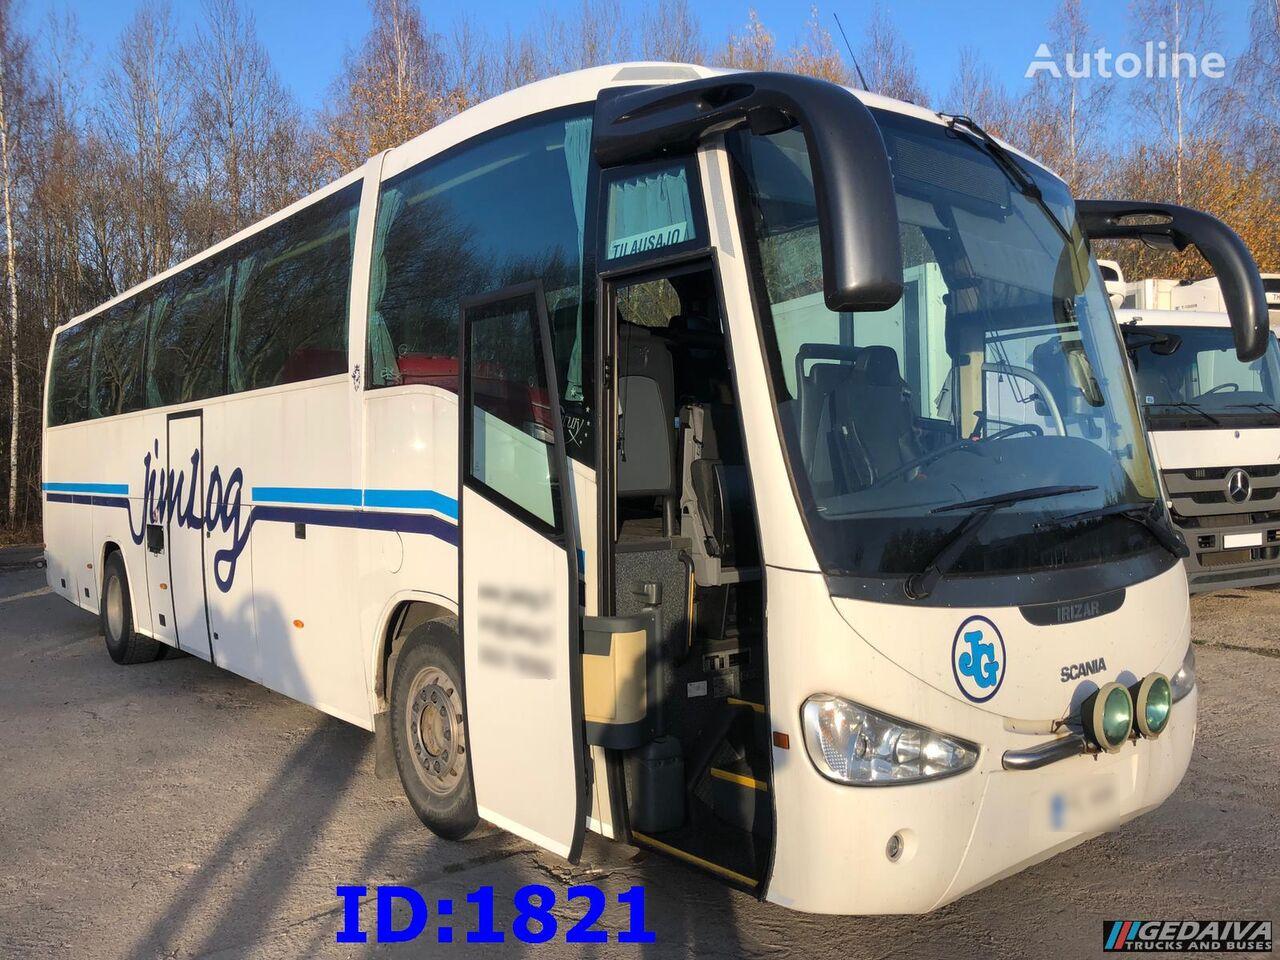 SCANIA  Irizar Century  coach bus